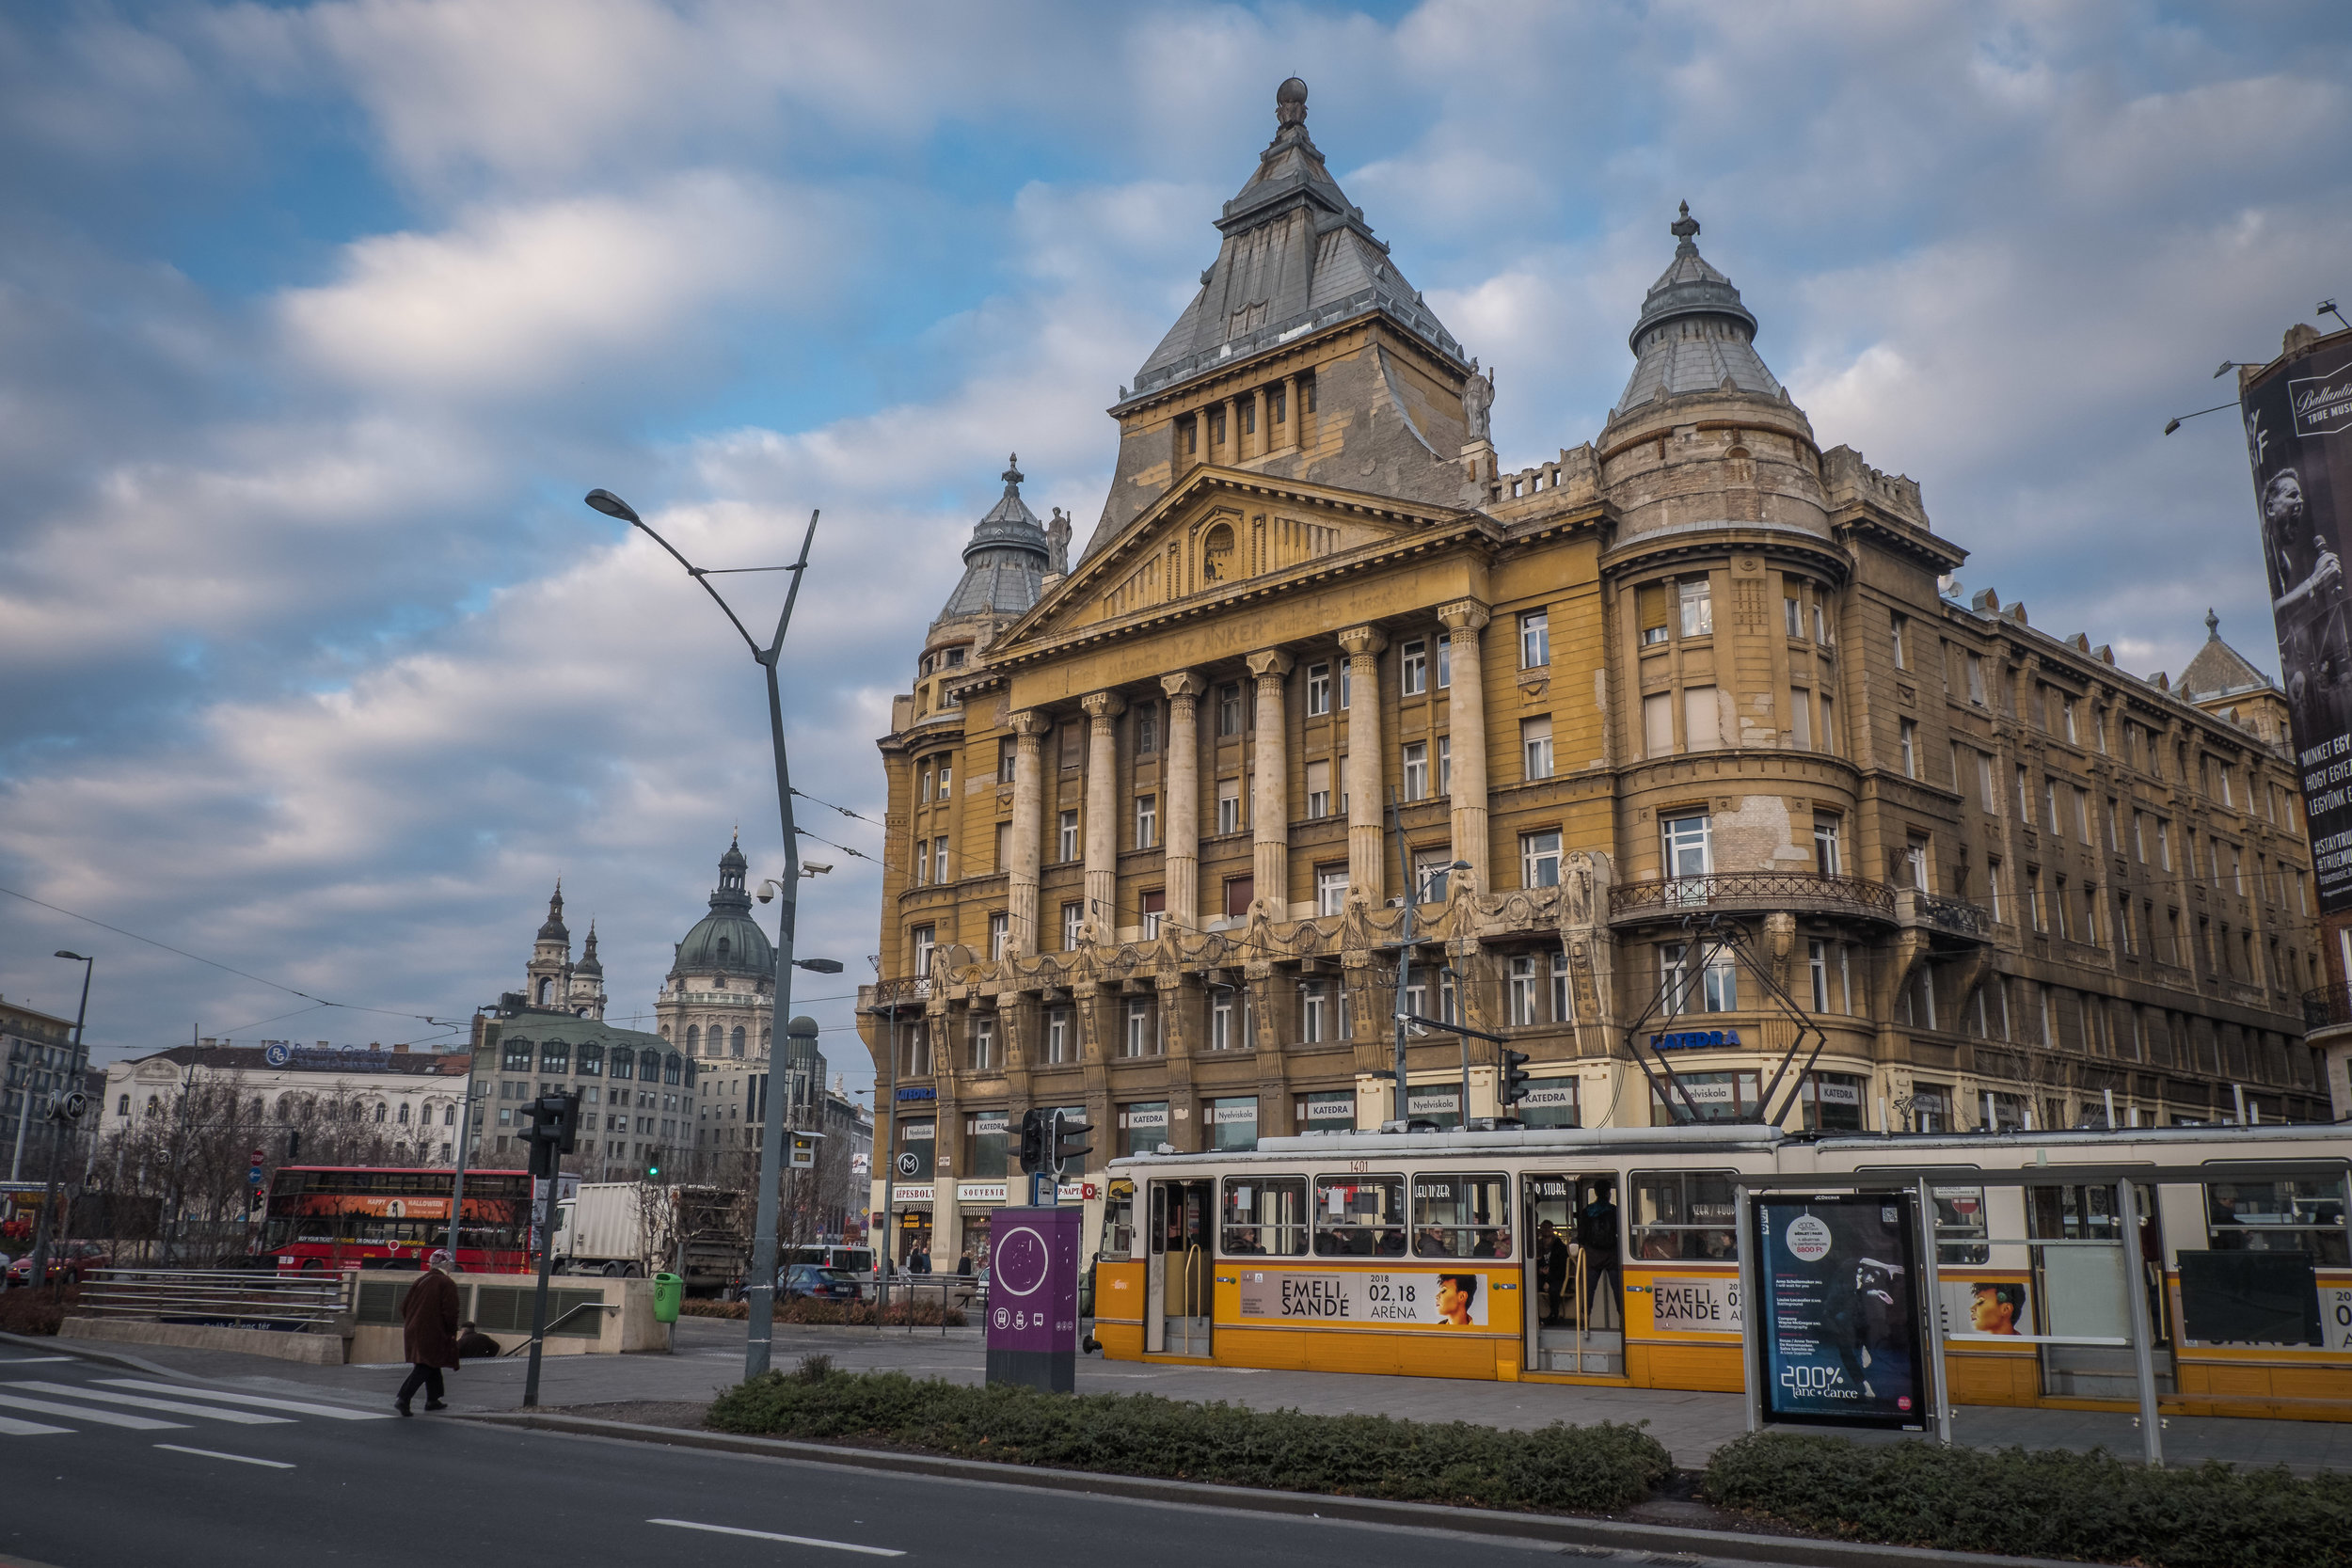 Anker Palace sits forlornly along busy Károly Street